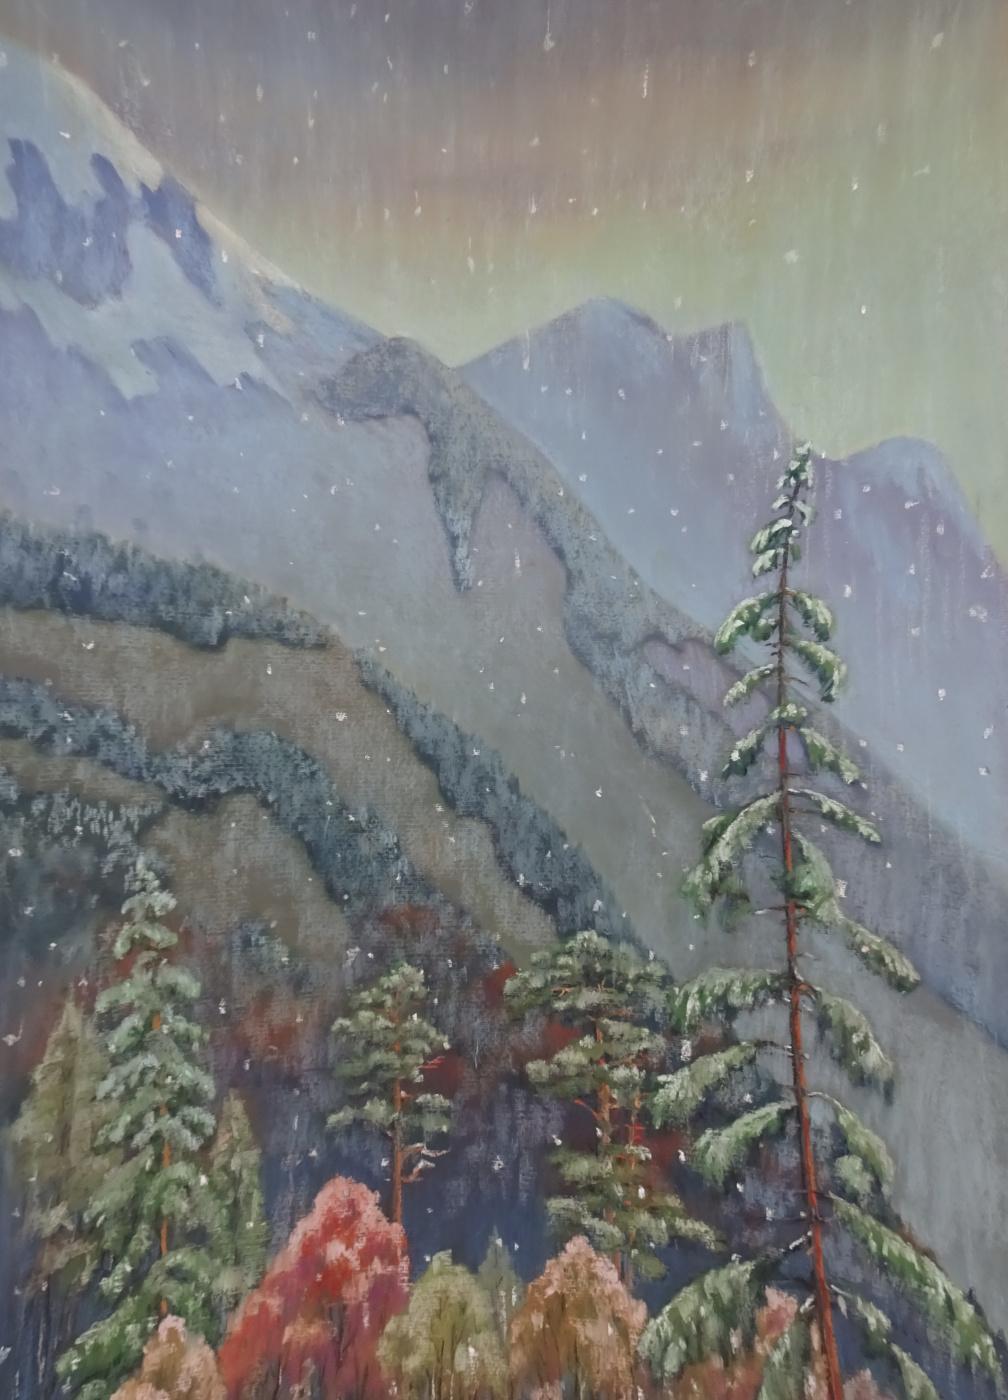 Sergey Ivanovich Elizarov. First snow in the mountains